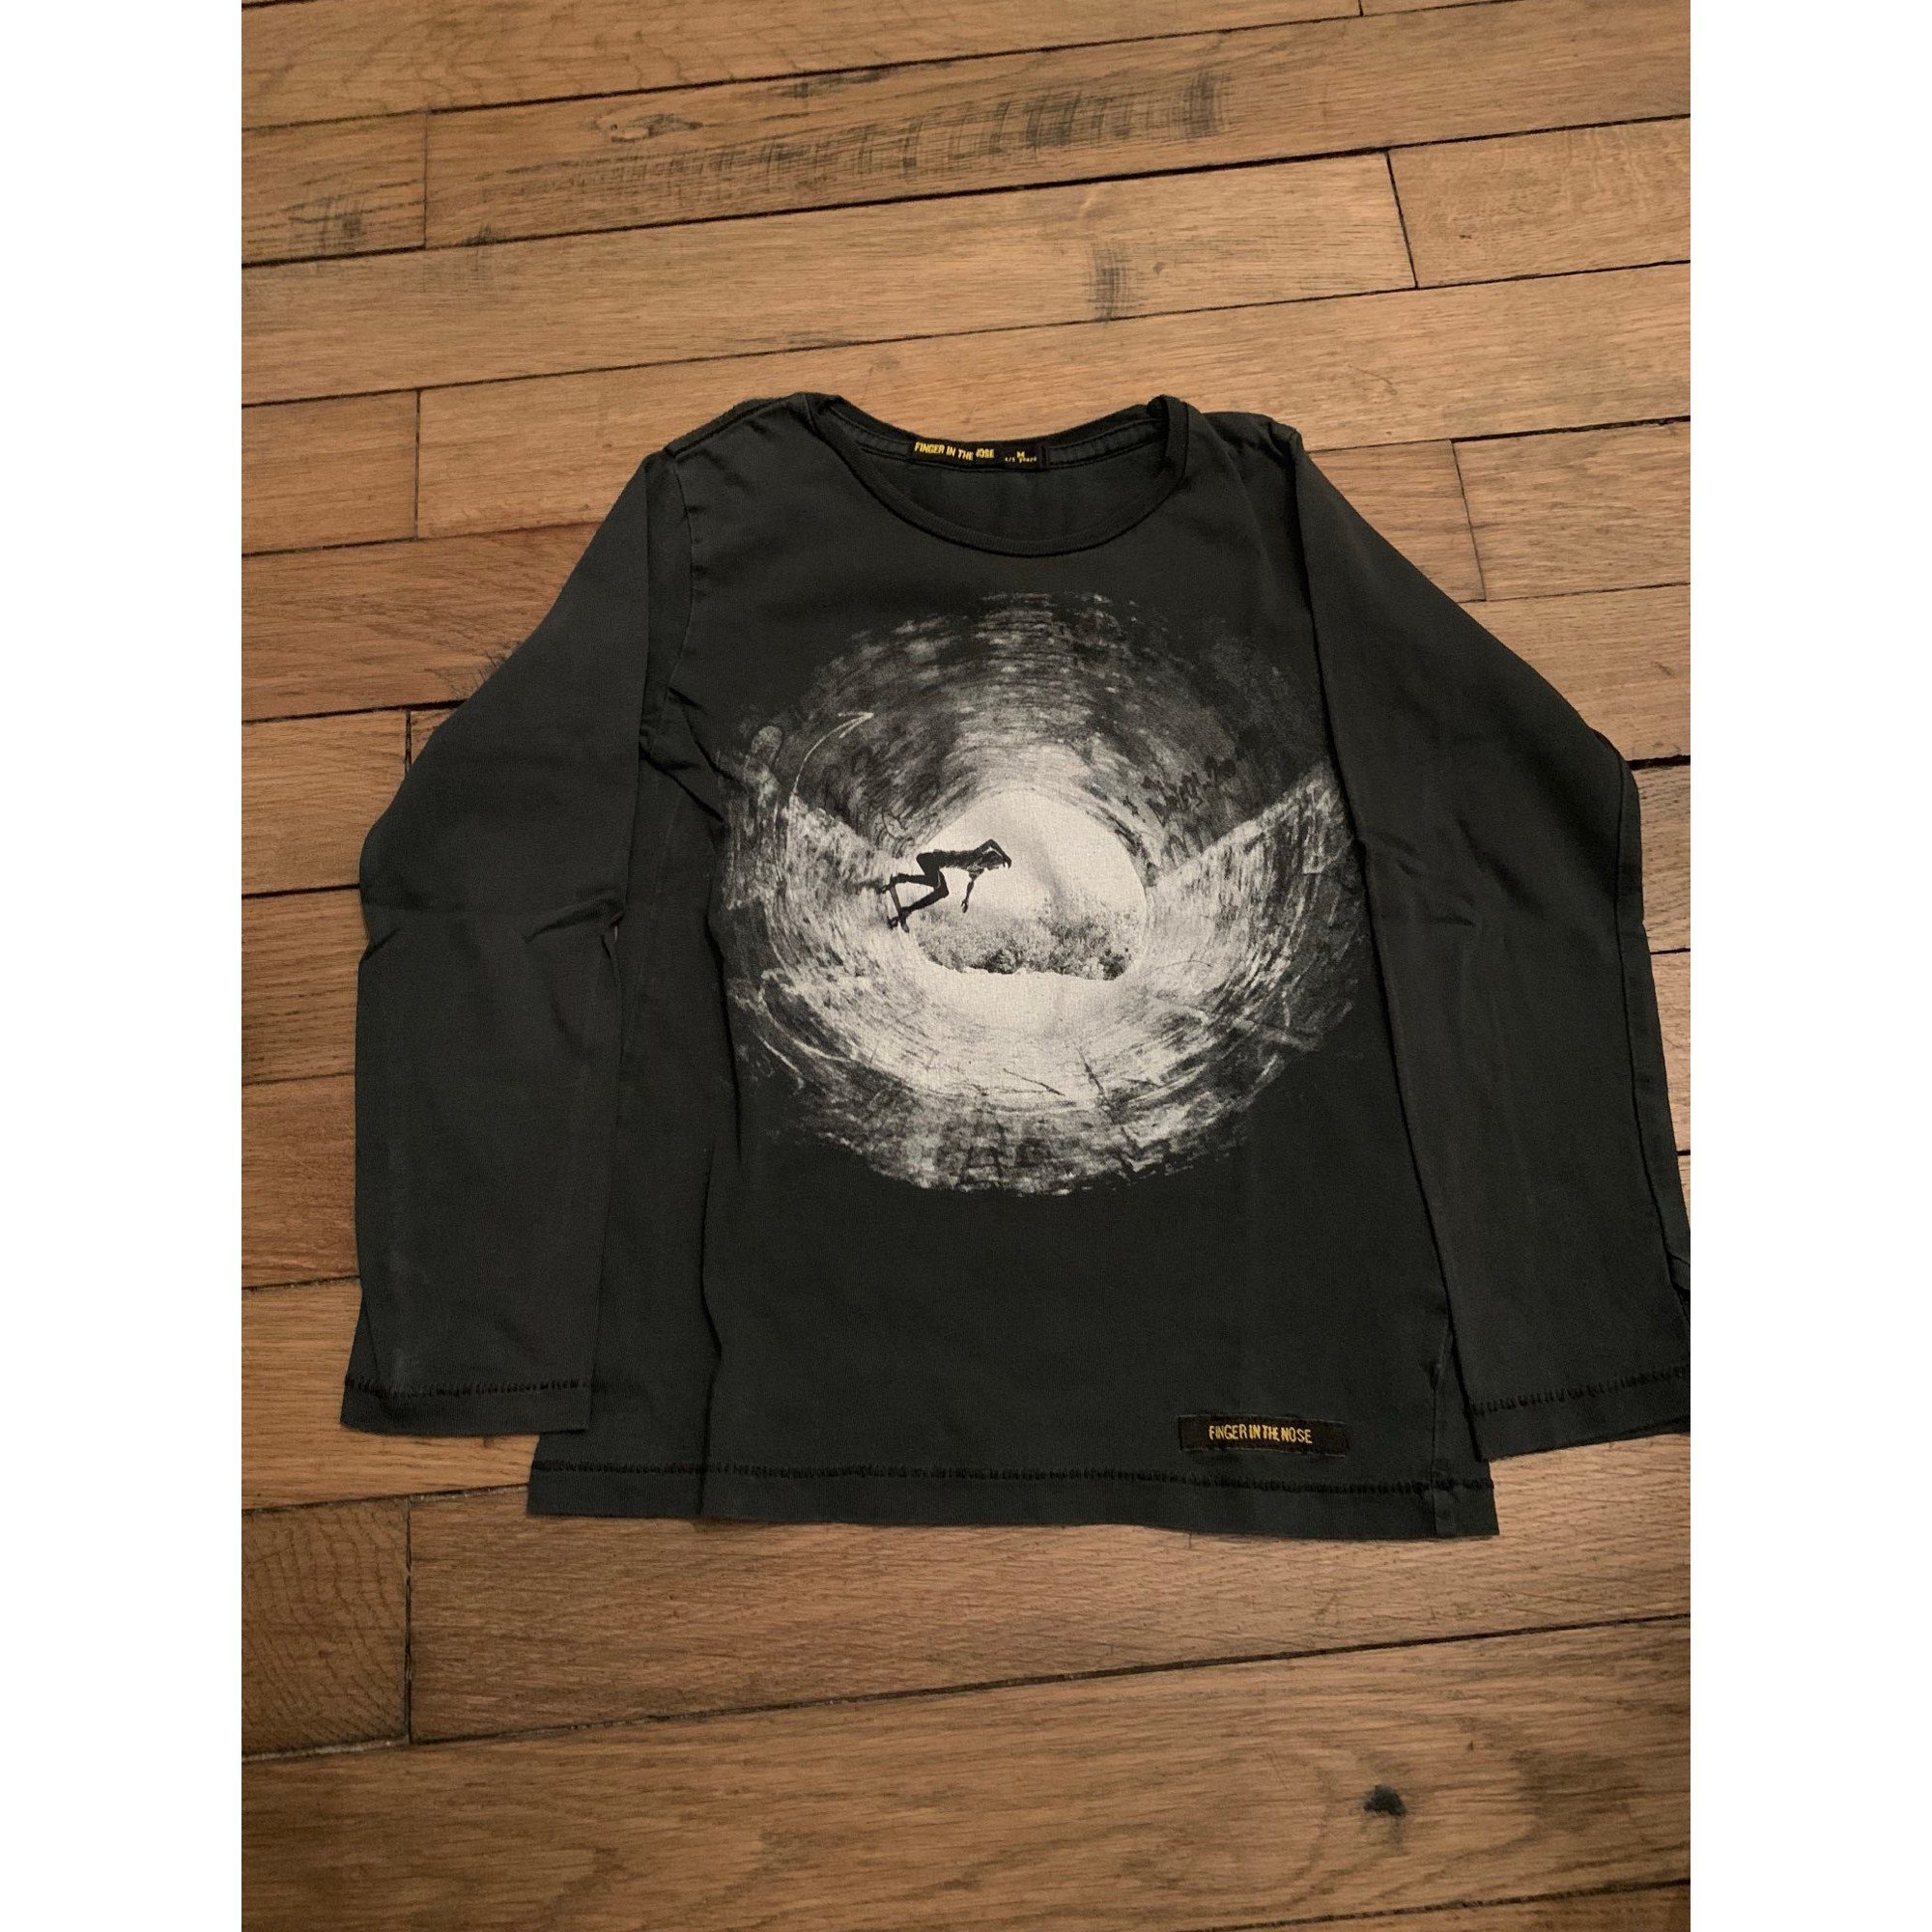 Tee-shirt FINGER IN THE NOSE Noir